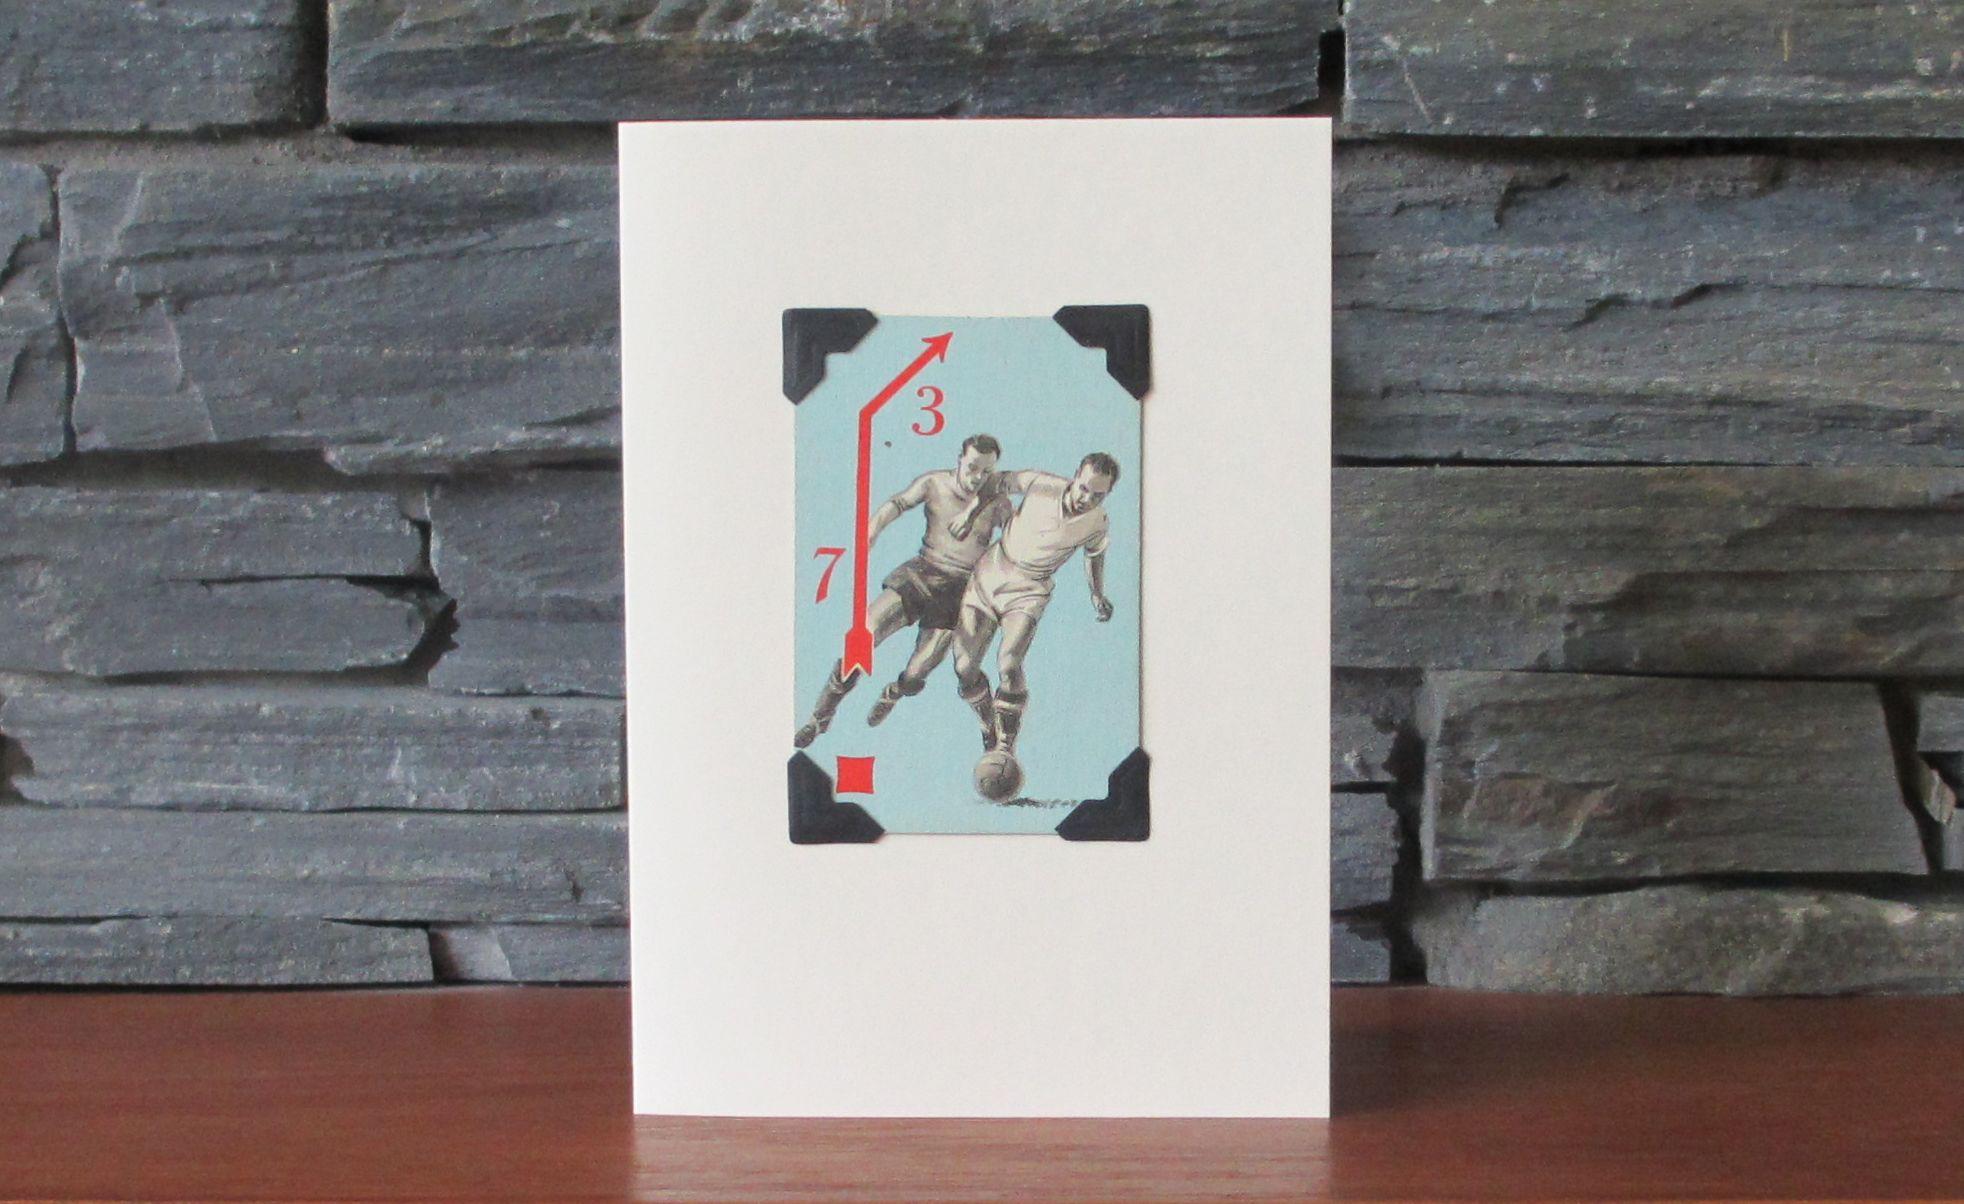 Fabulous handmade greetings card with an original football playing fabulous handmade greetings card with an original football playing card buy now at kristyandbryce Choice Image